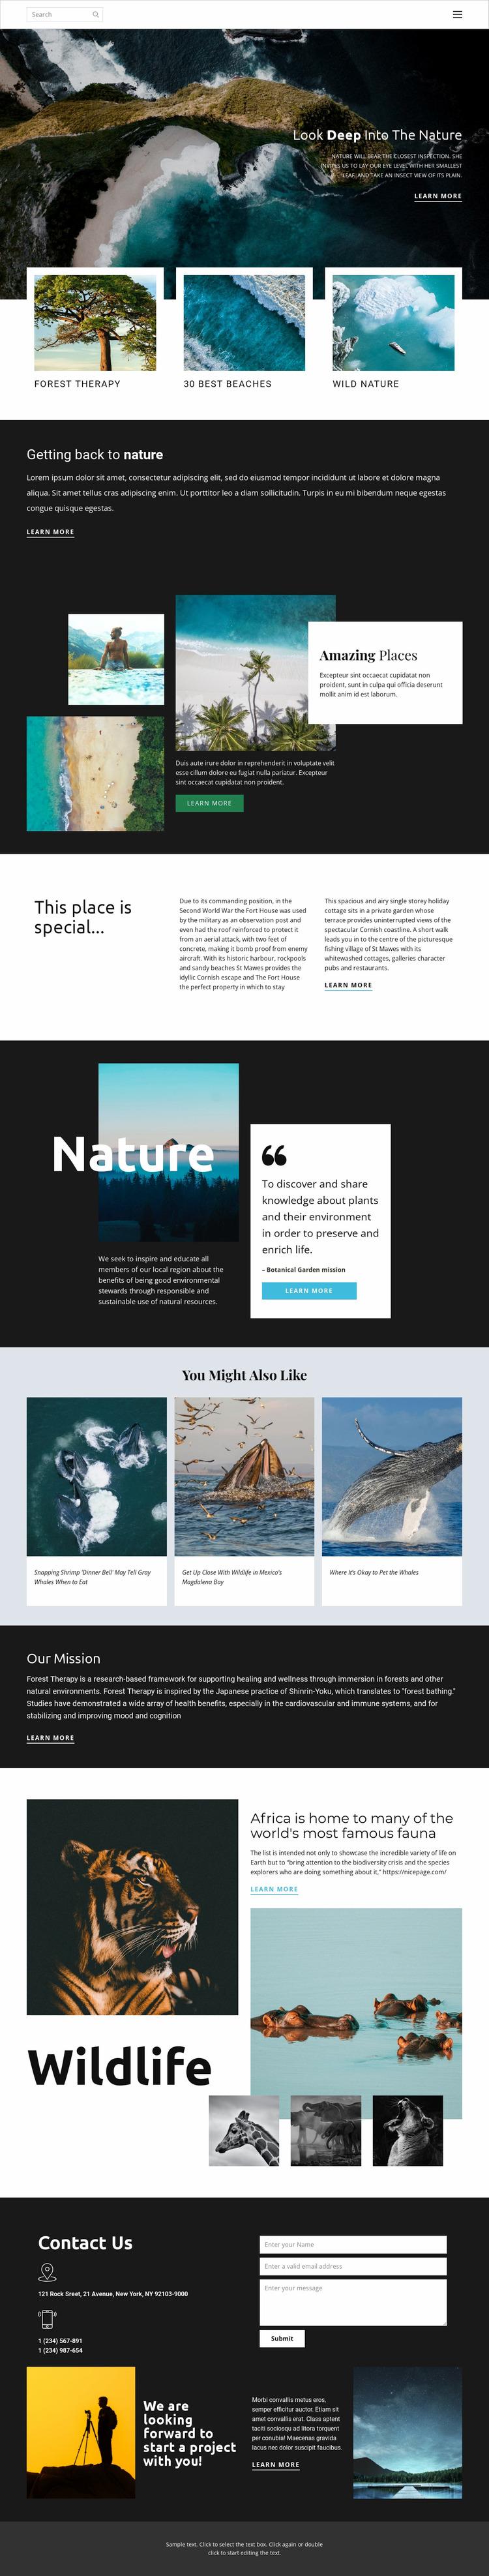 Exploring wildlife and nature WordPress Website Builder